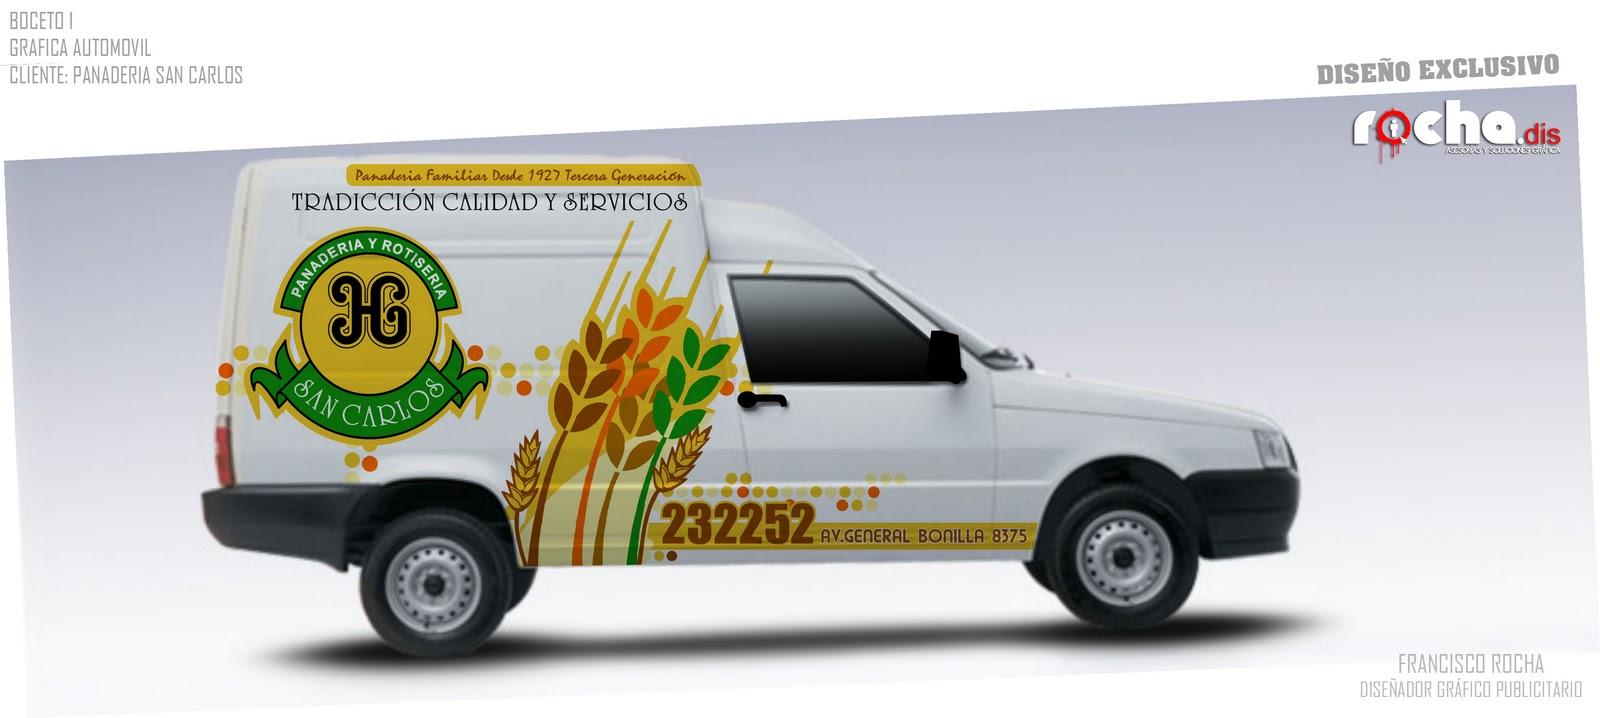 Grafica Vehicular / Panaderia San Carlos